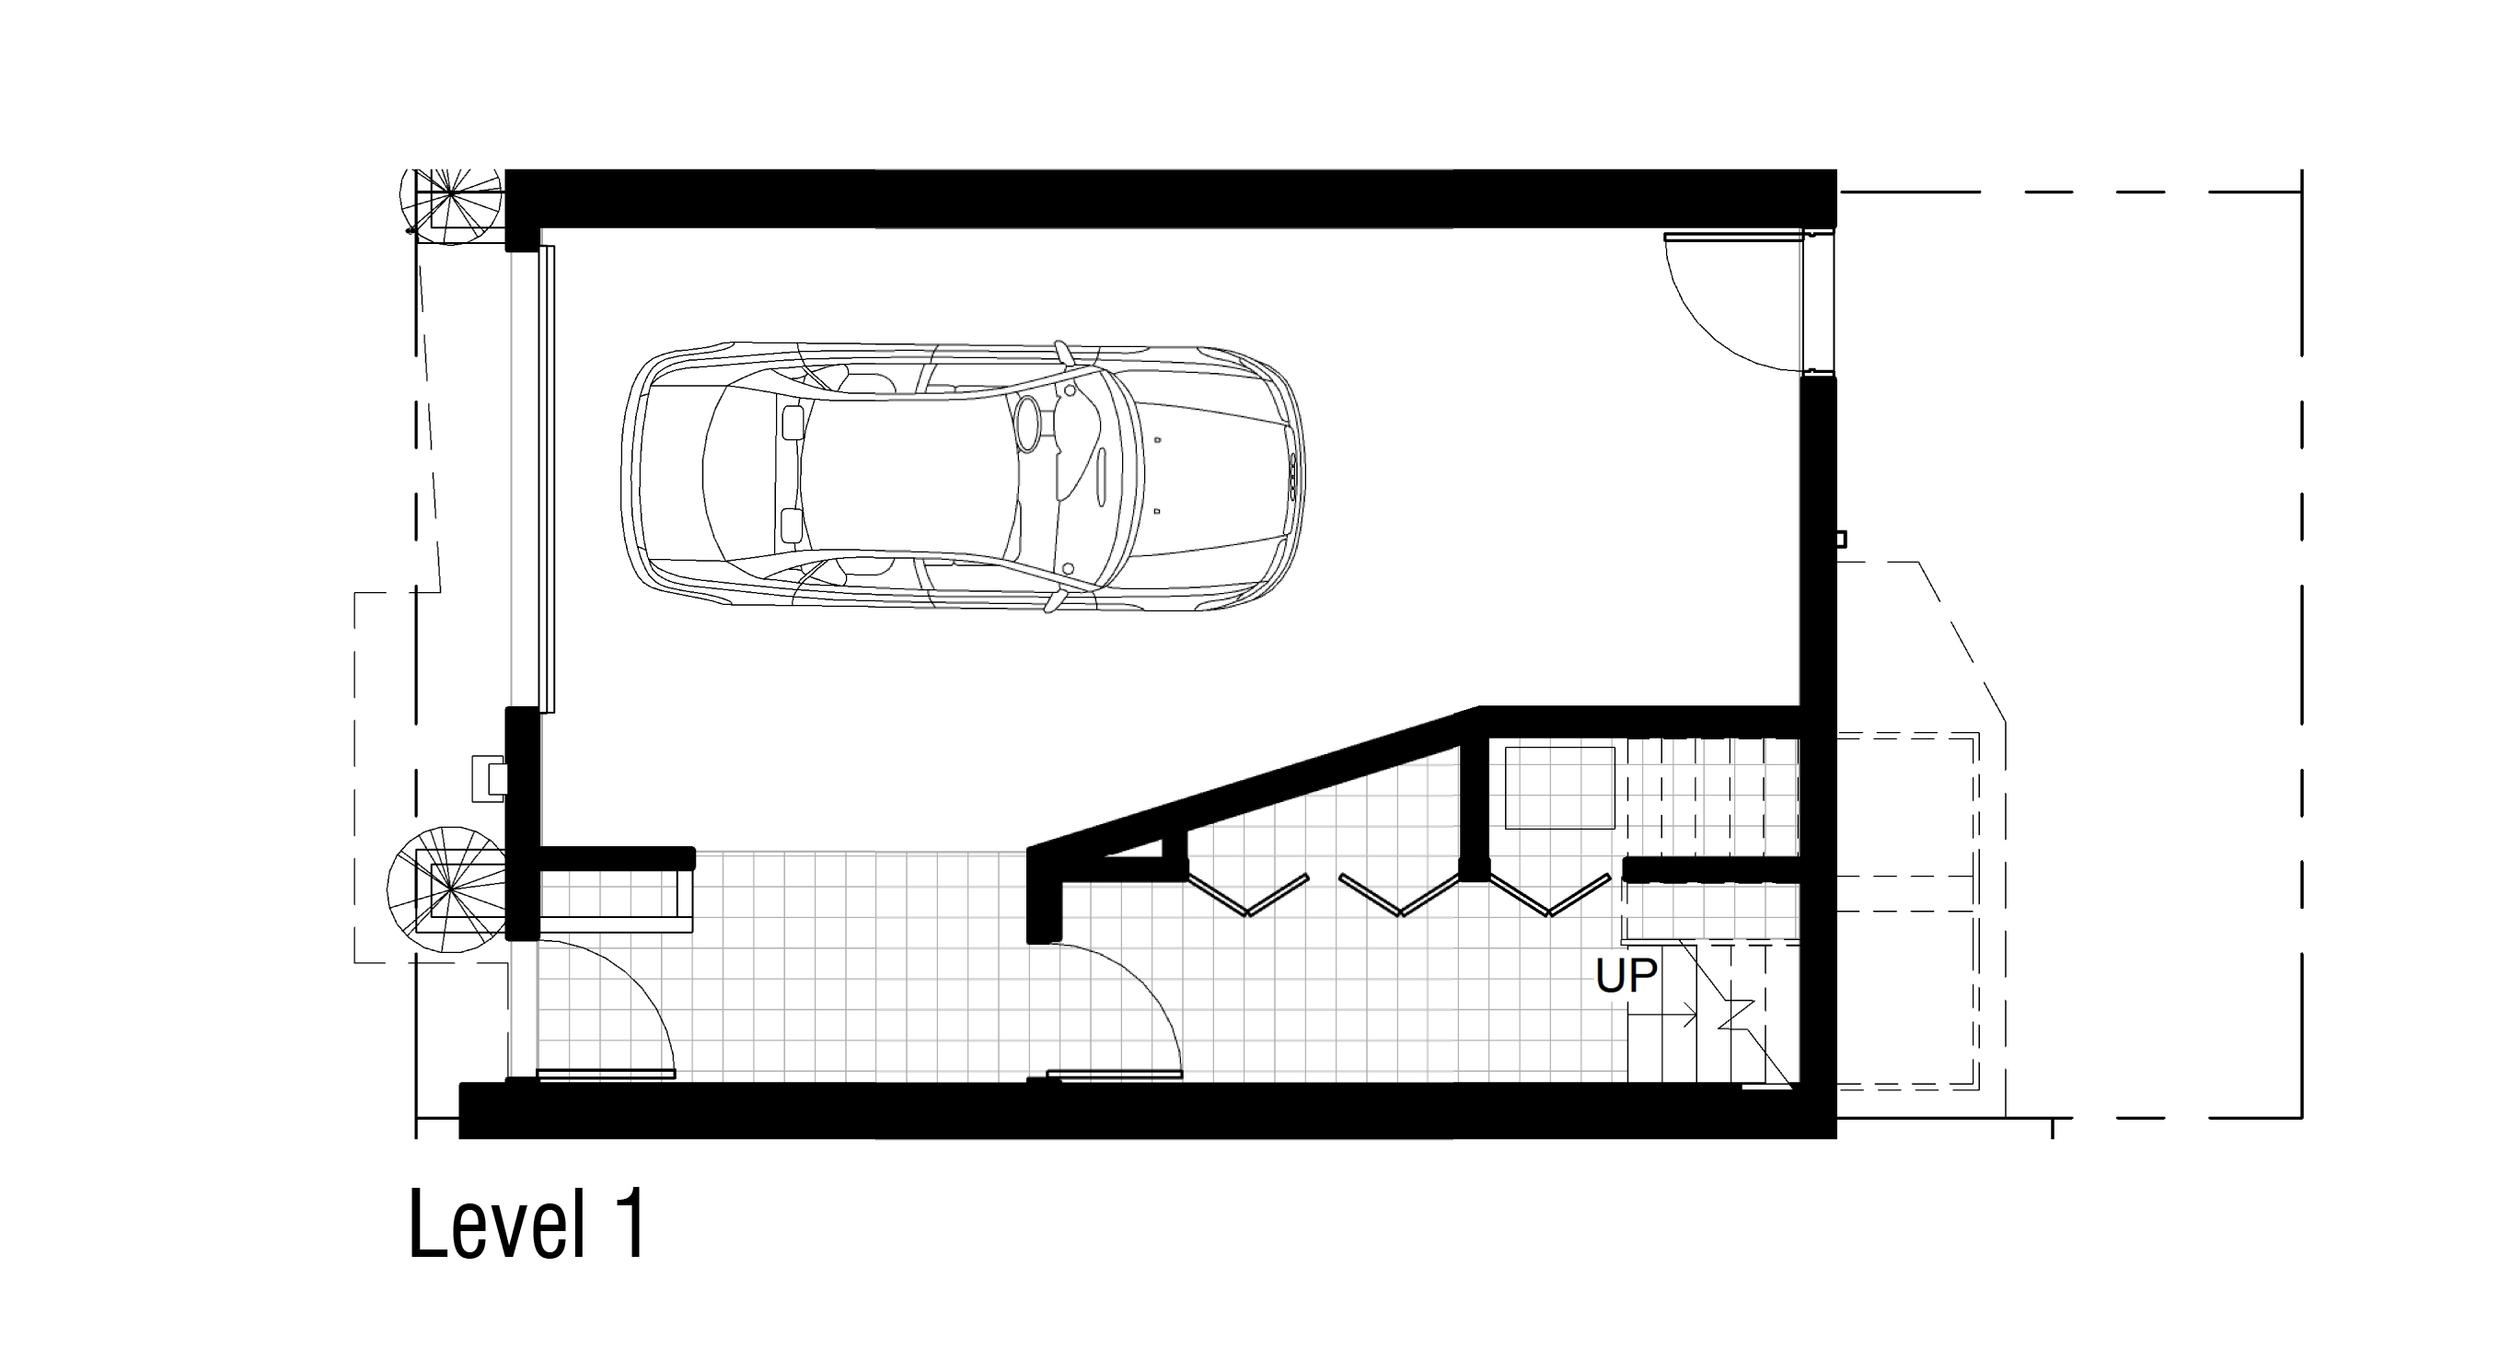 12001_834N4St_Townhouse_Plan01.jpg